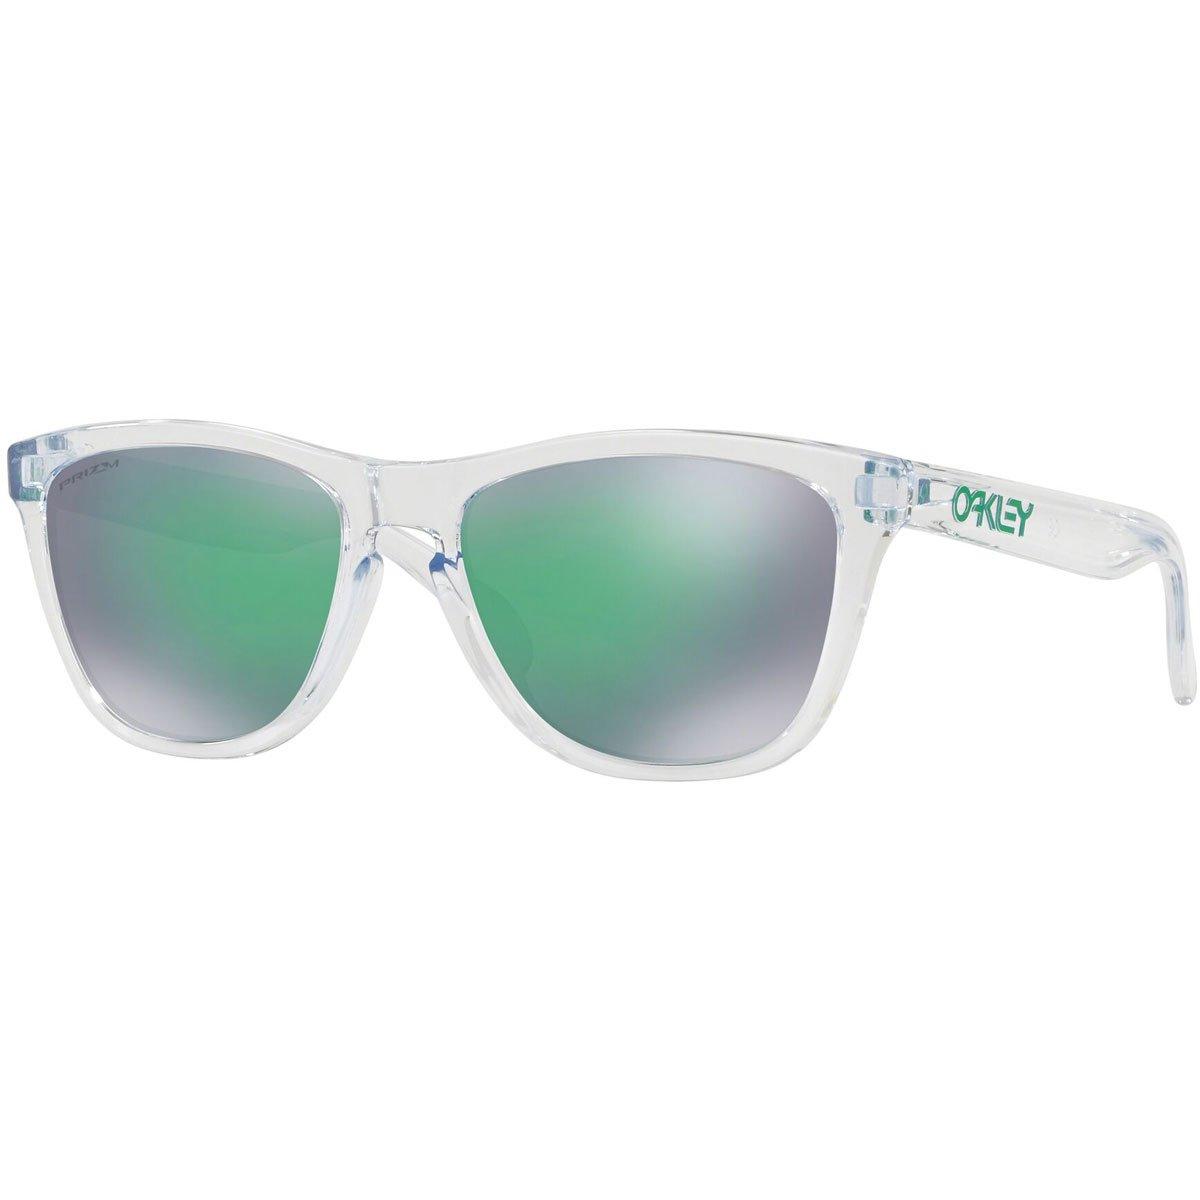 Oakley Men's OO9013 Frogskins Square Sunglasses, Crystal Clear/Prizm Jade, 55 mm by Oakley